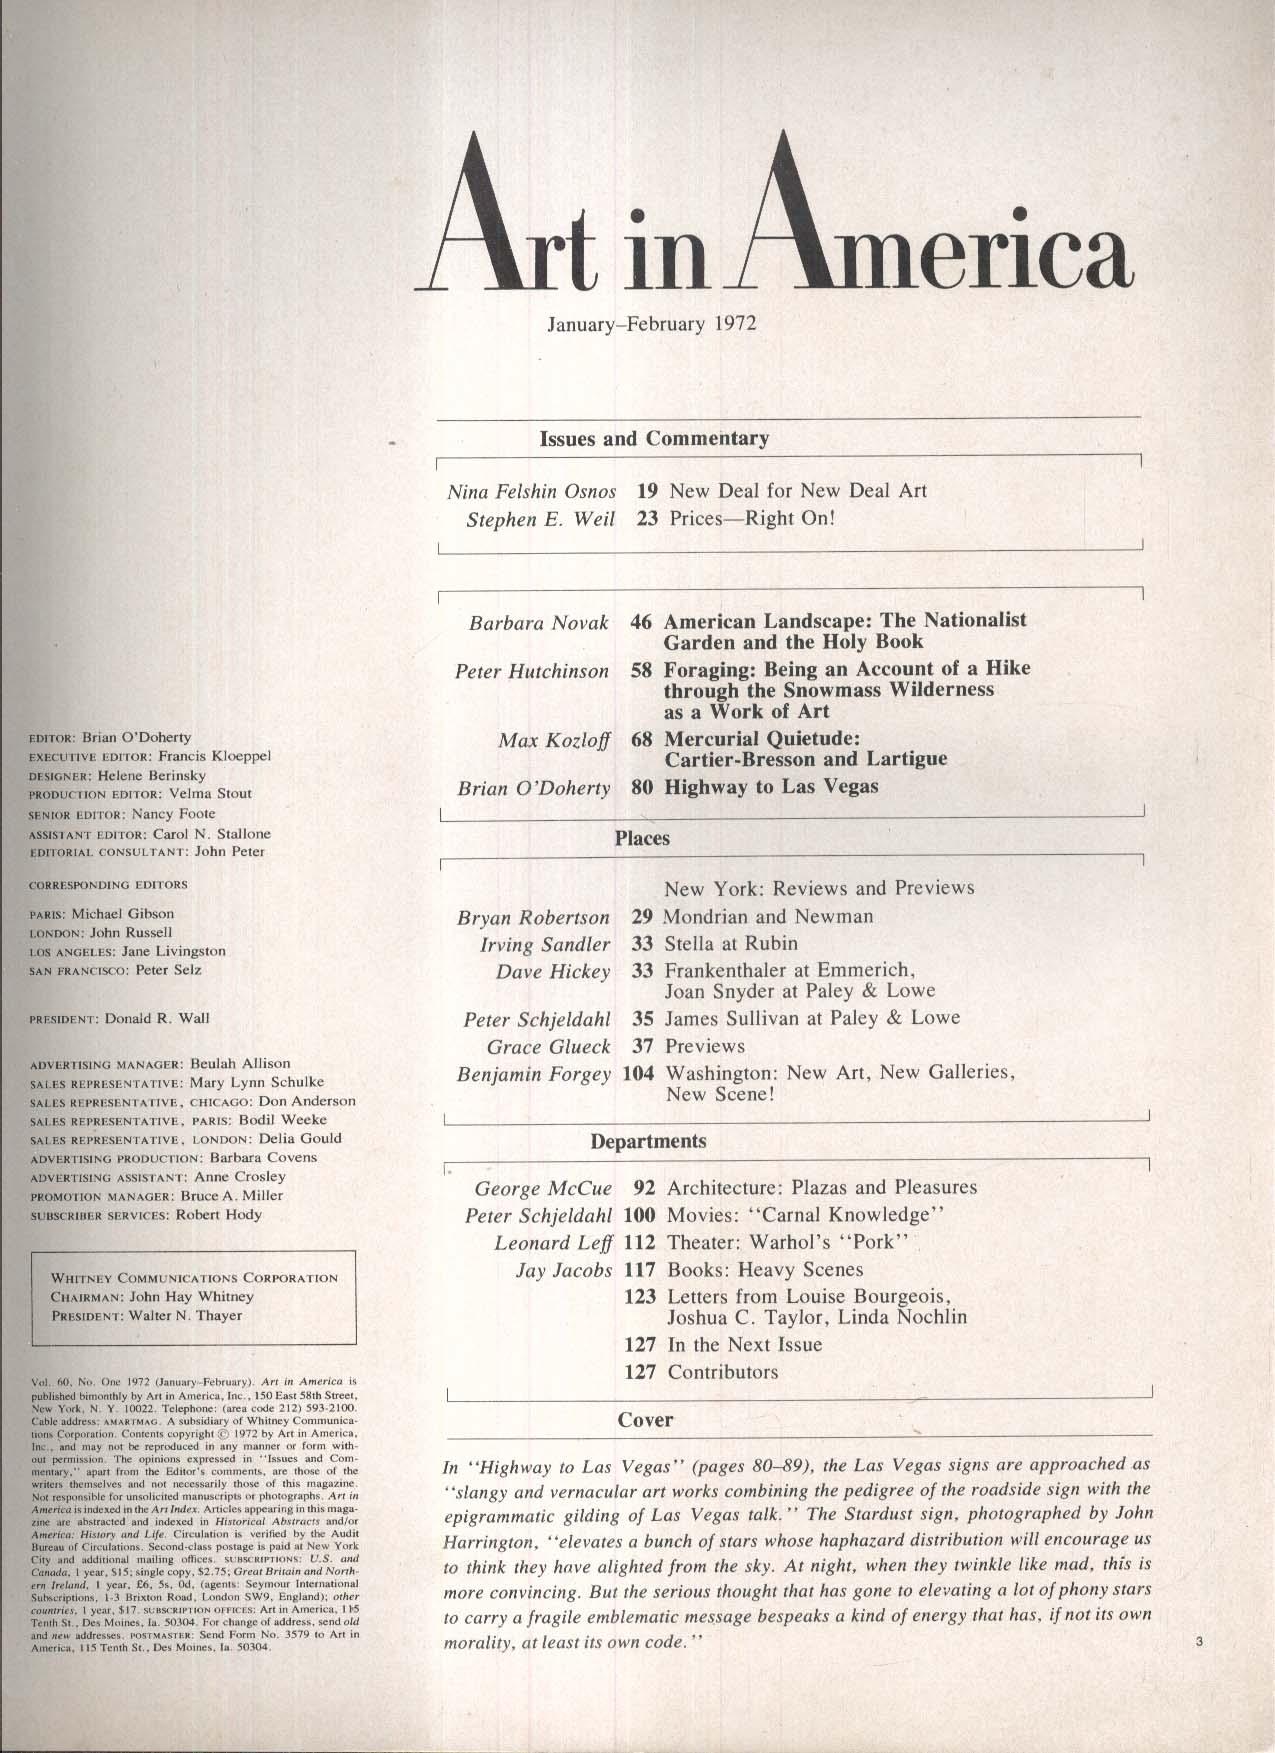 ART IN AMERICA Cartier-Bresson Lartigue Frankenthaler Emmerich ++ 1-2 1972